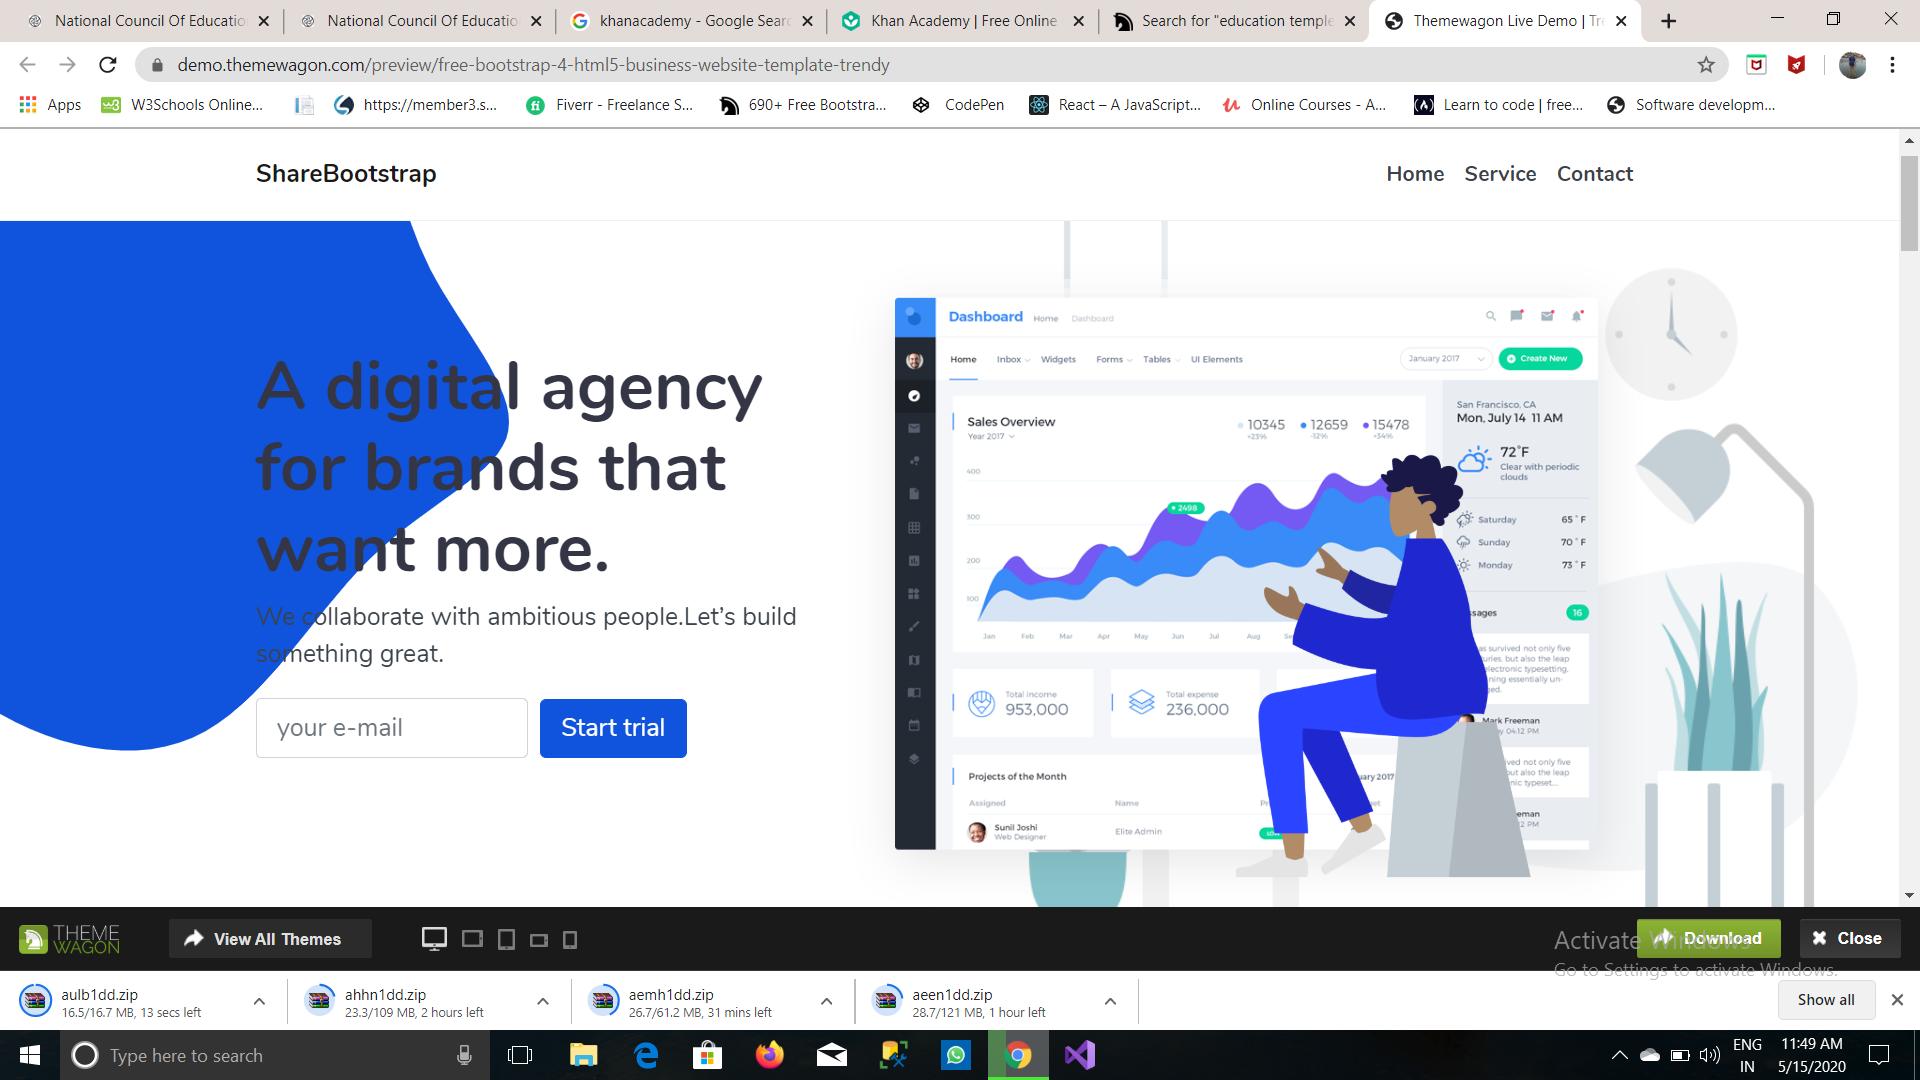 Stunning Dynamic Website Design In 2020 Website Design Digital Agencies Digital Marketing